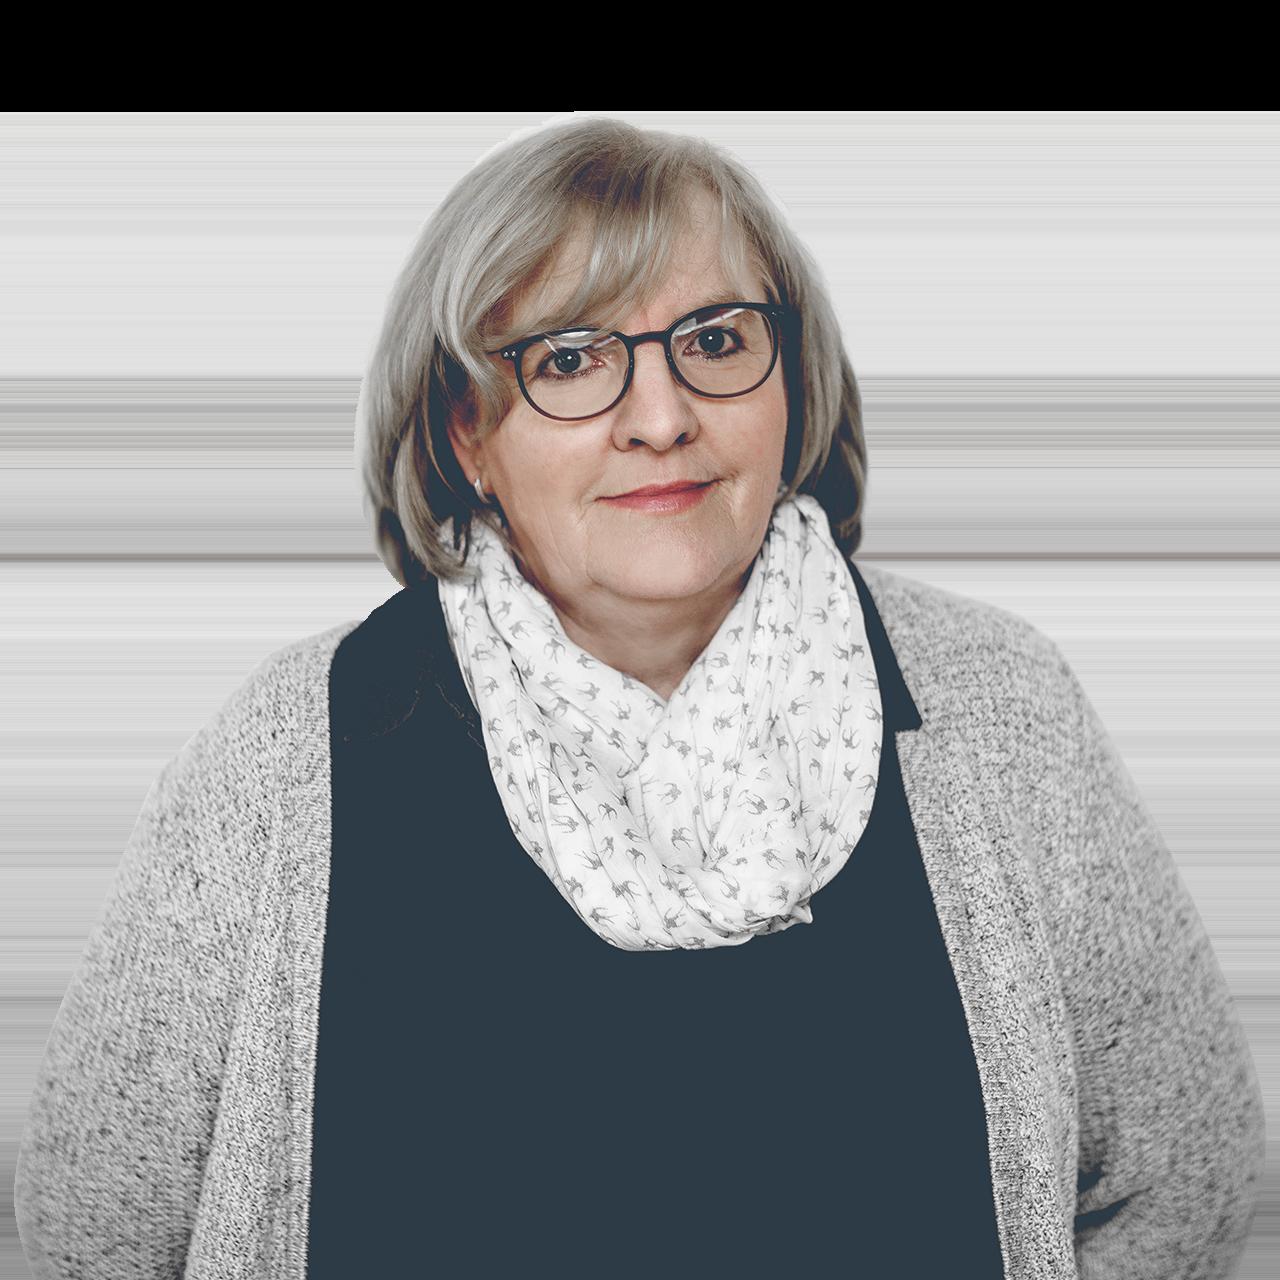 Gudrun Möller